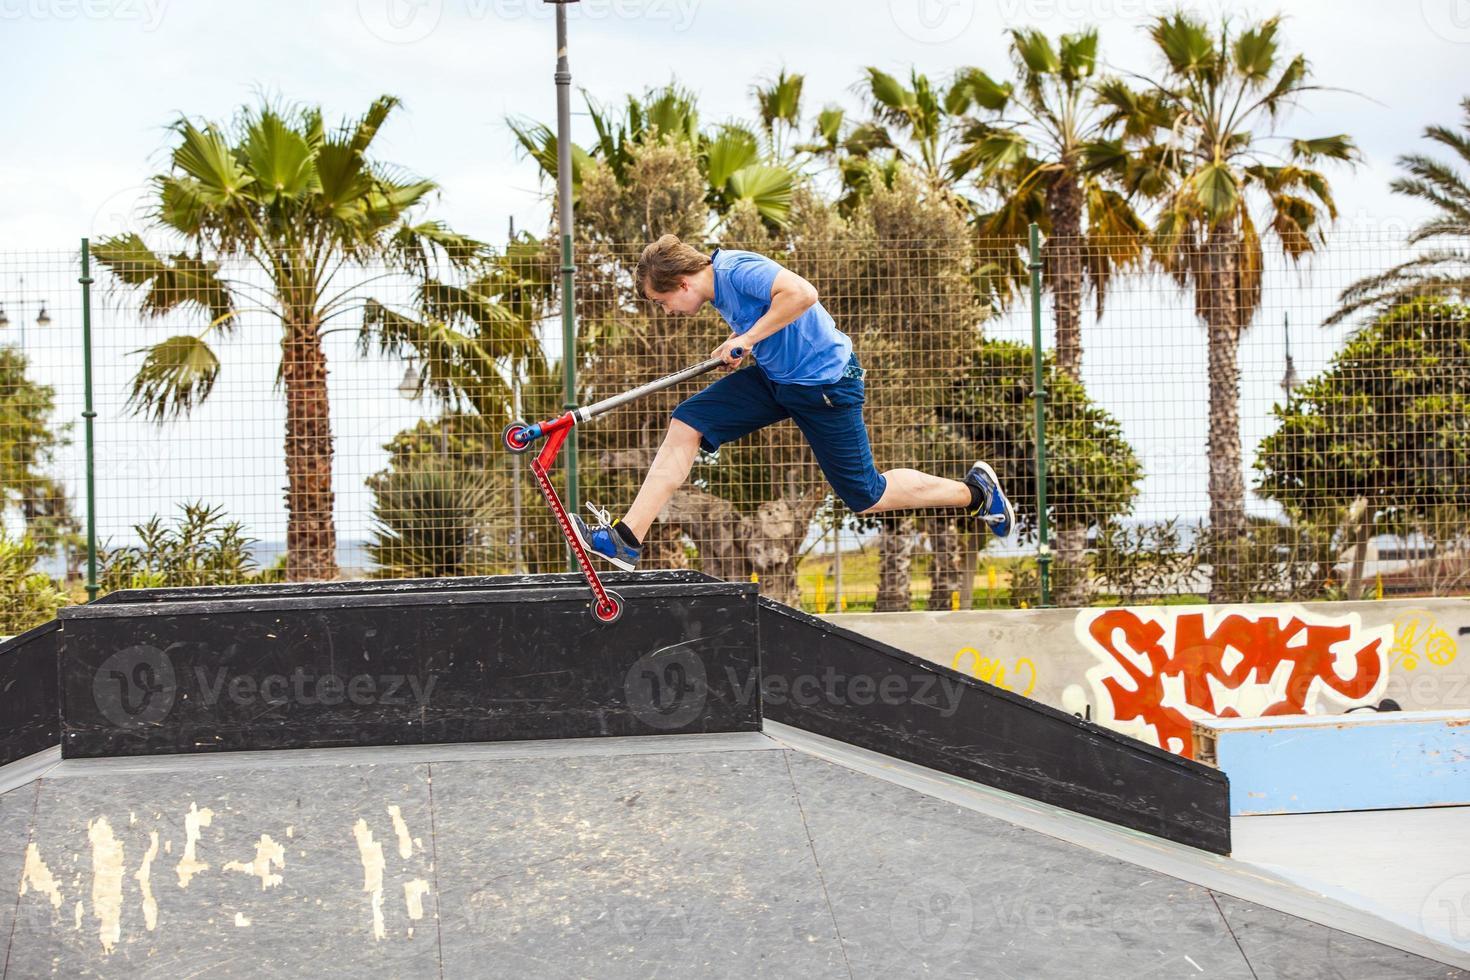 Teen boy monte son scooter au skate park photo